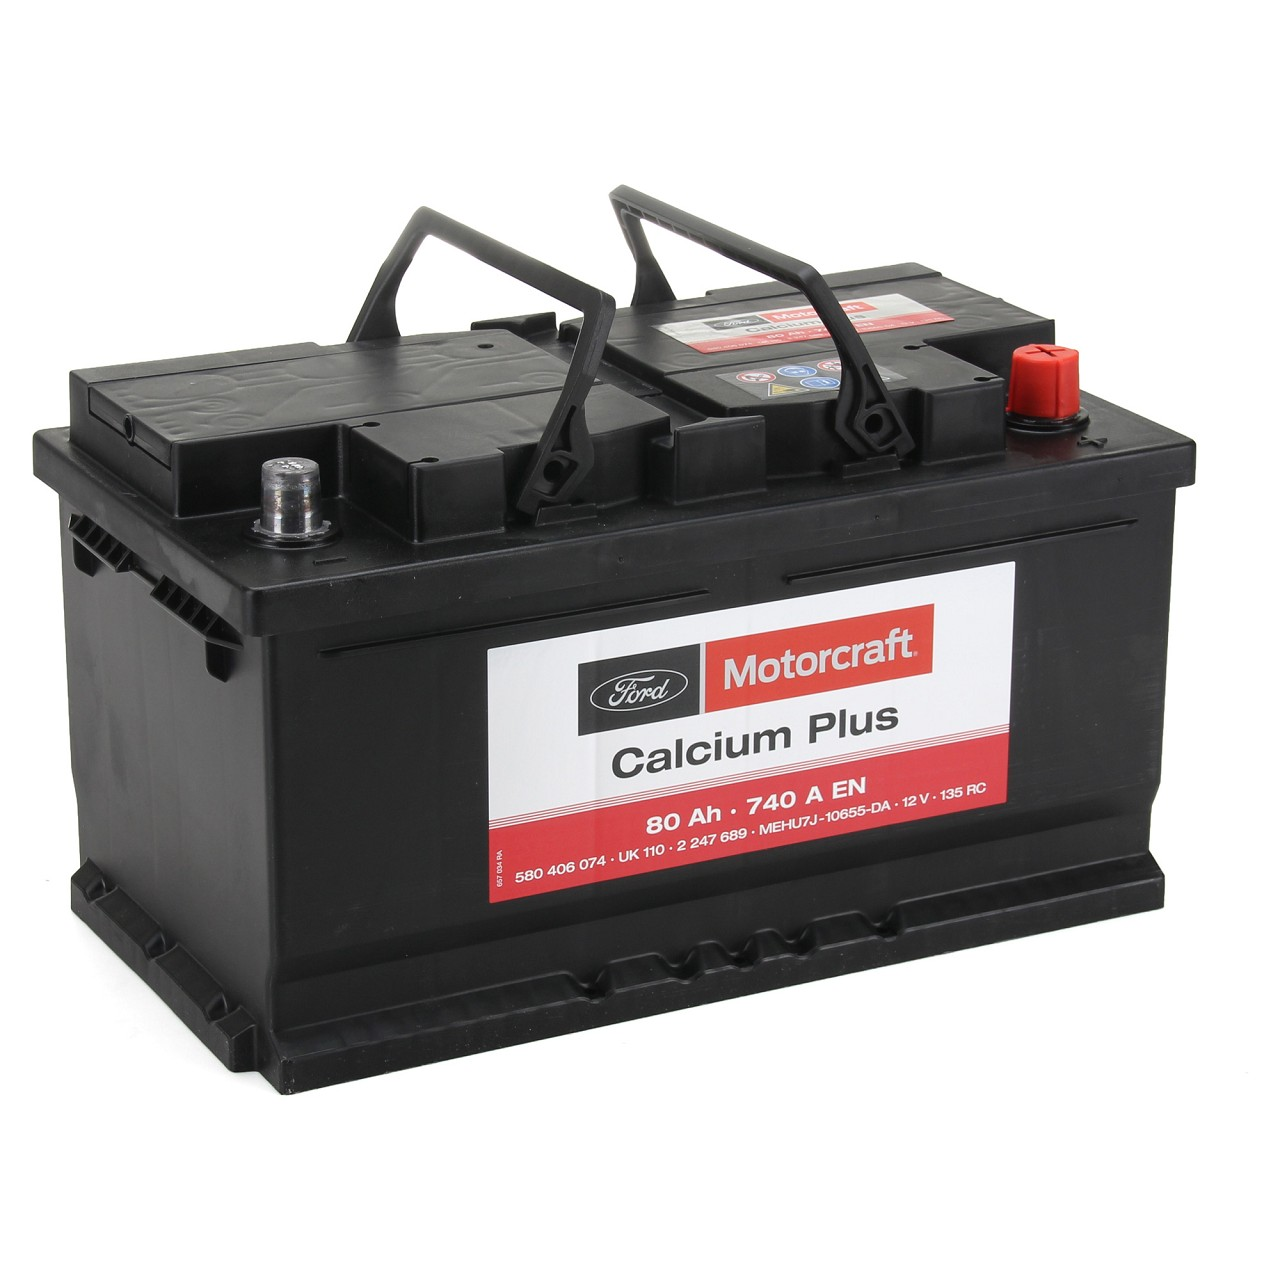 ORIGINAL Ford MOTORCRAFT Autobatterie Batterie Starterbatterie 12V 80Ah 2247689